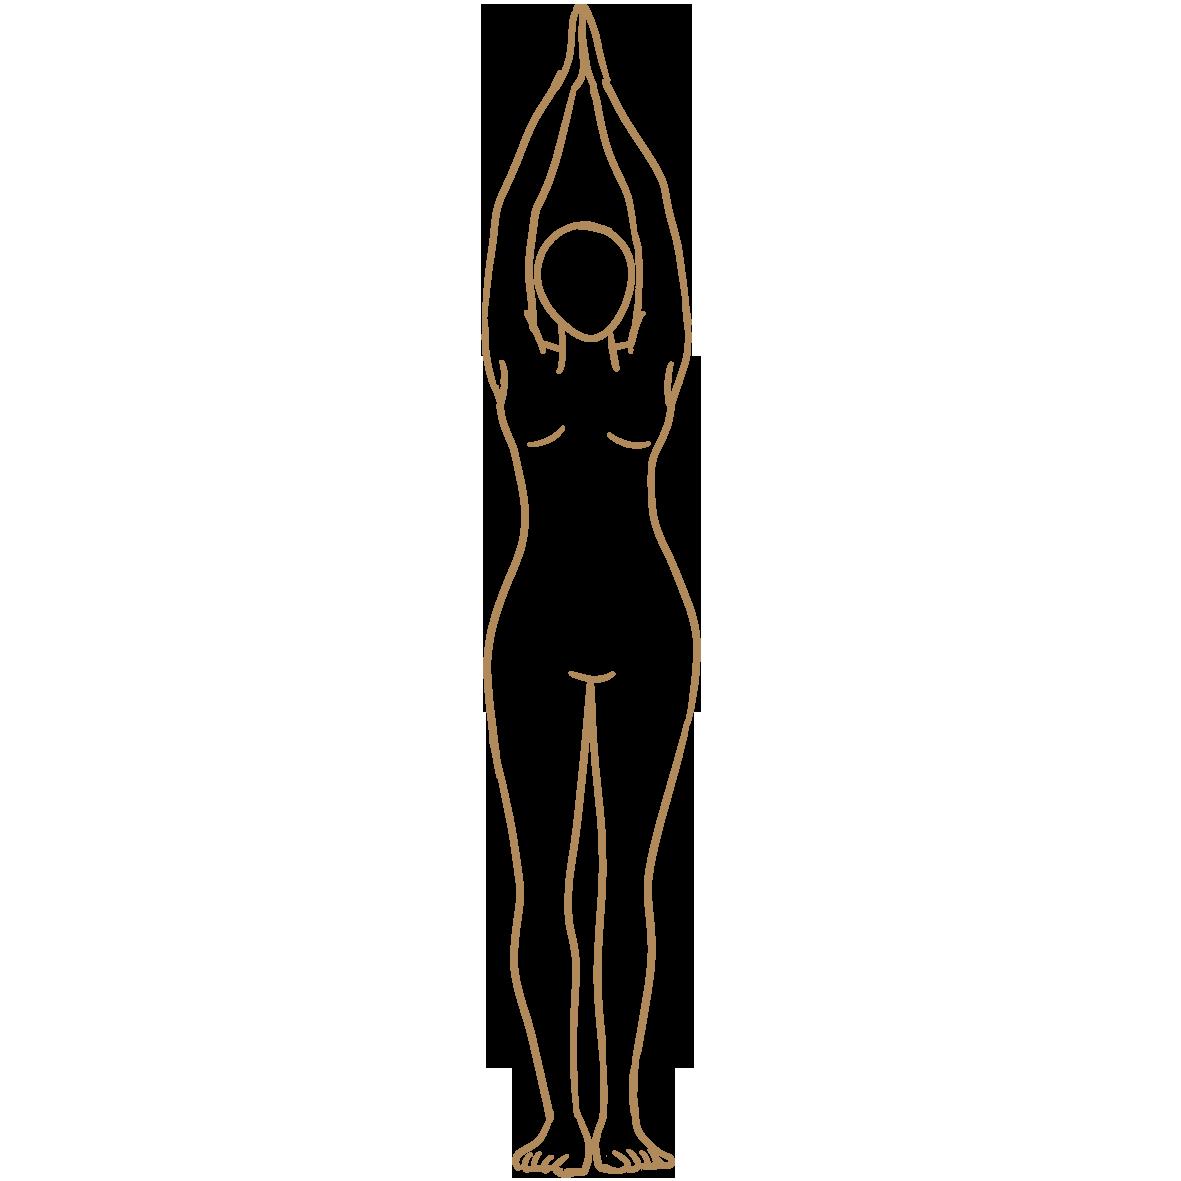 willow waist and dai mai meditation…